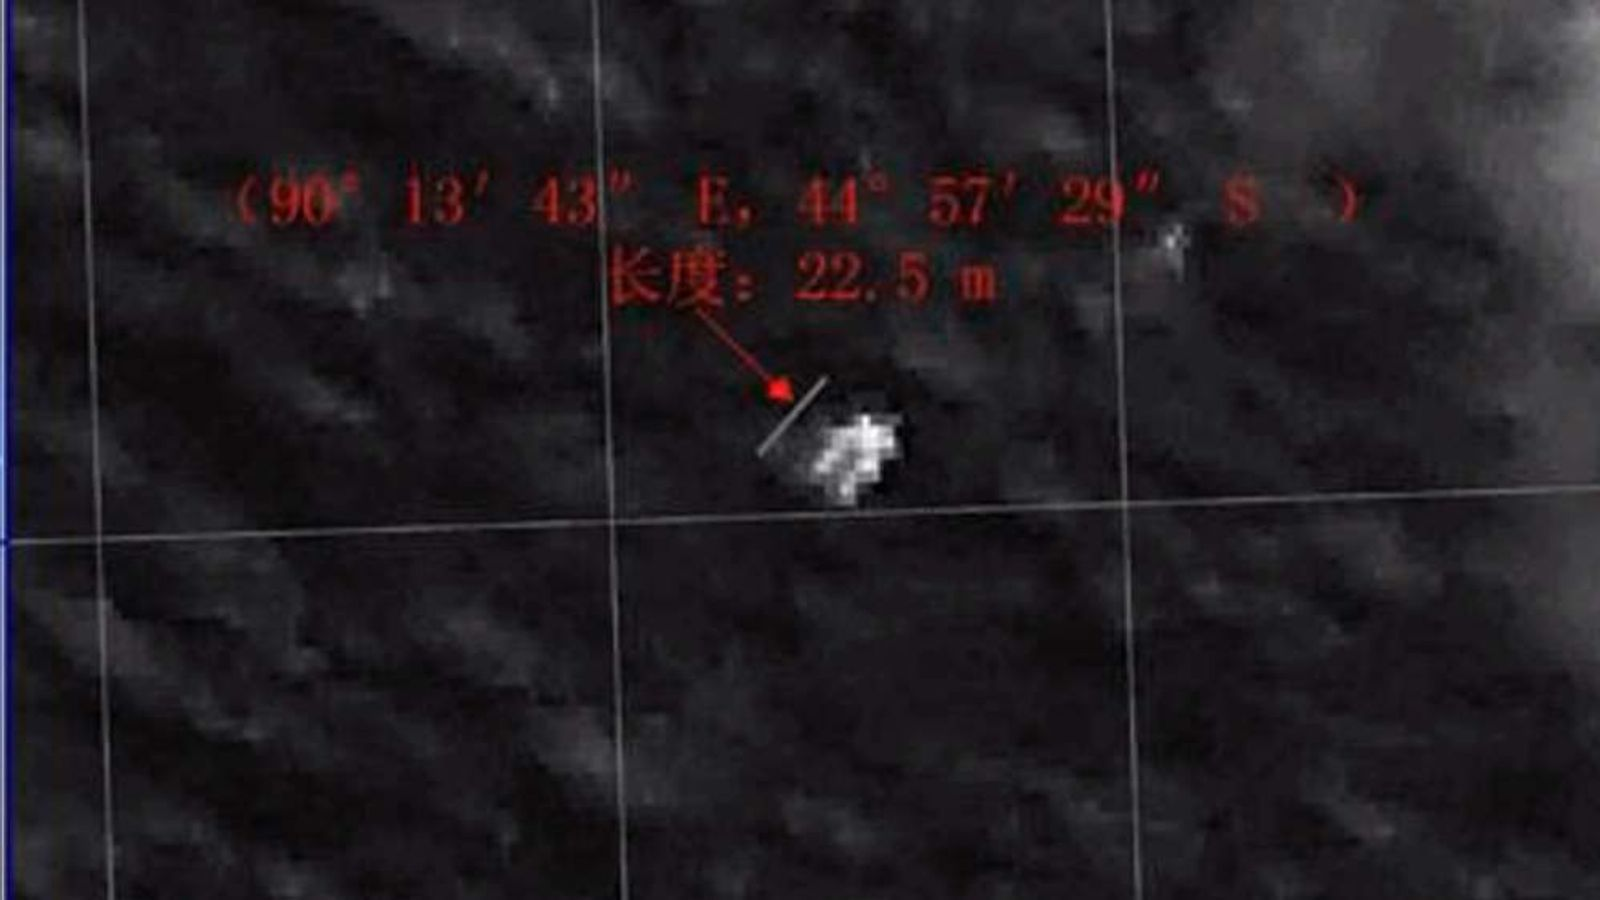 220314 PLANE satellite image chinese object close